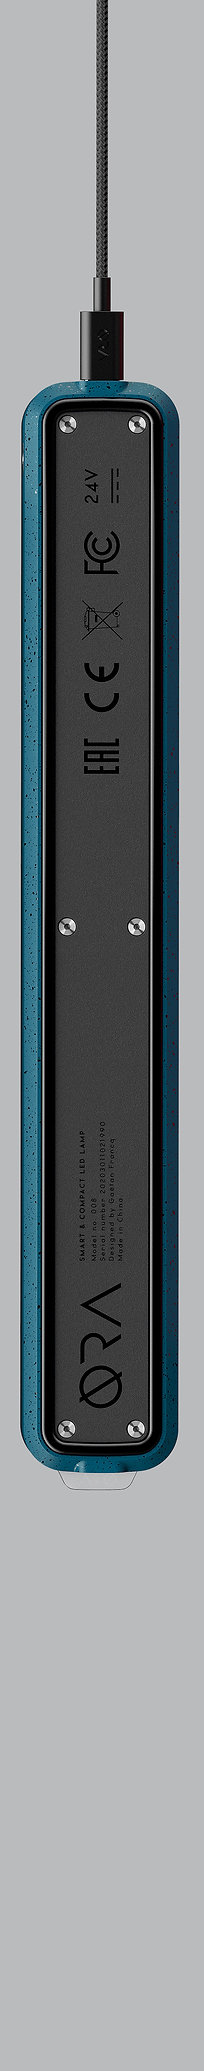 Lampe de bureau design pliable bleu